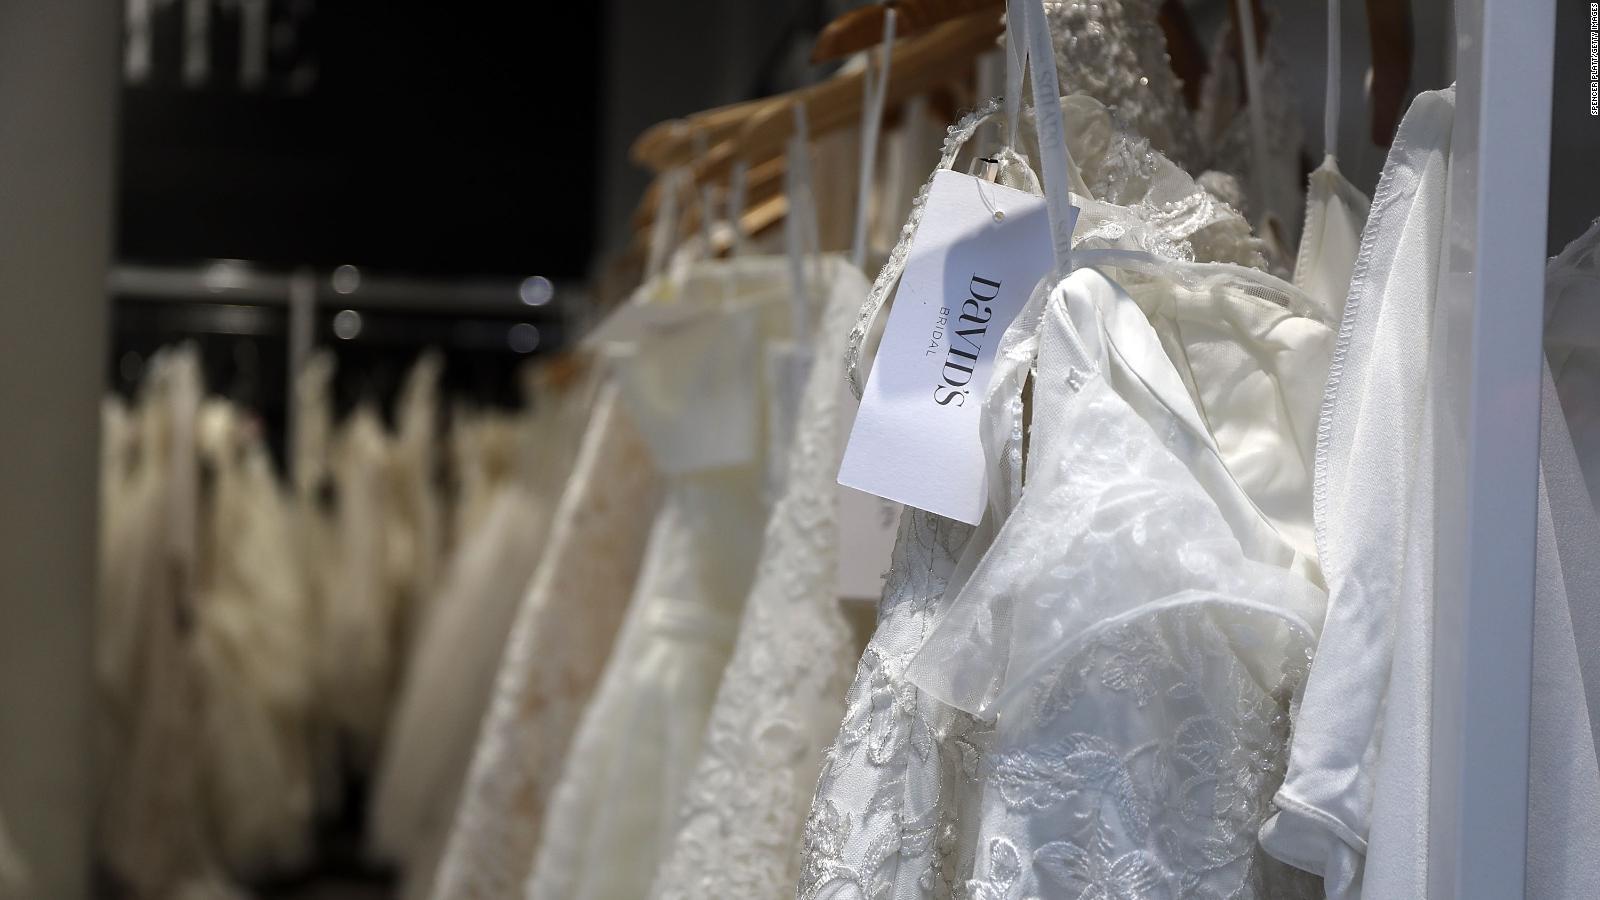 Bridal Gowns Will Be In Short Supply For Wedding Season Because Of Coronavirus Cnn,Wedding Dress Sample Sale 2020 Los Angeles